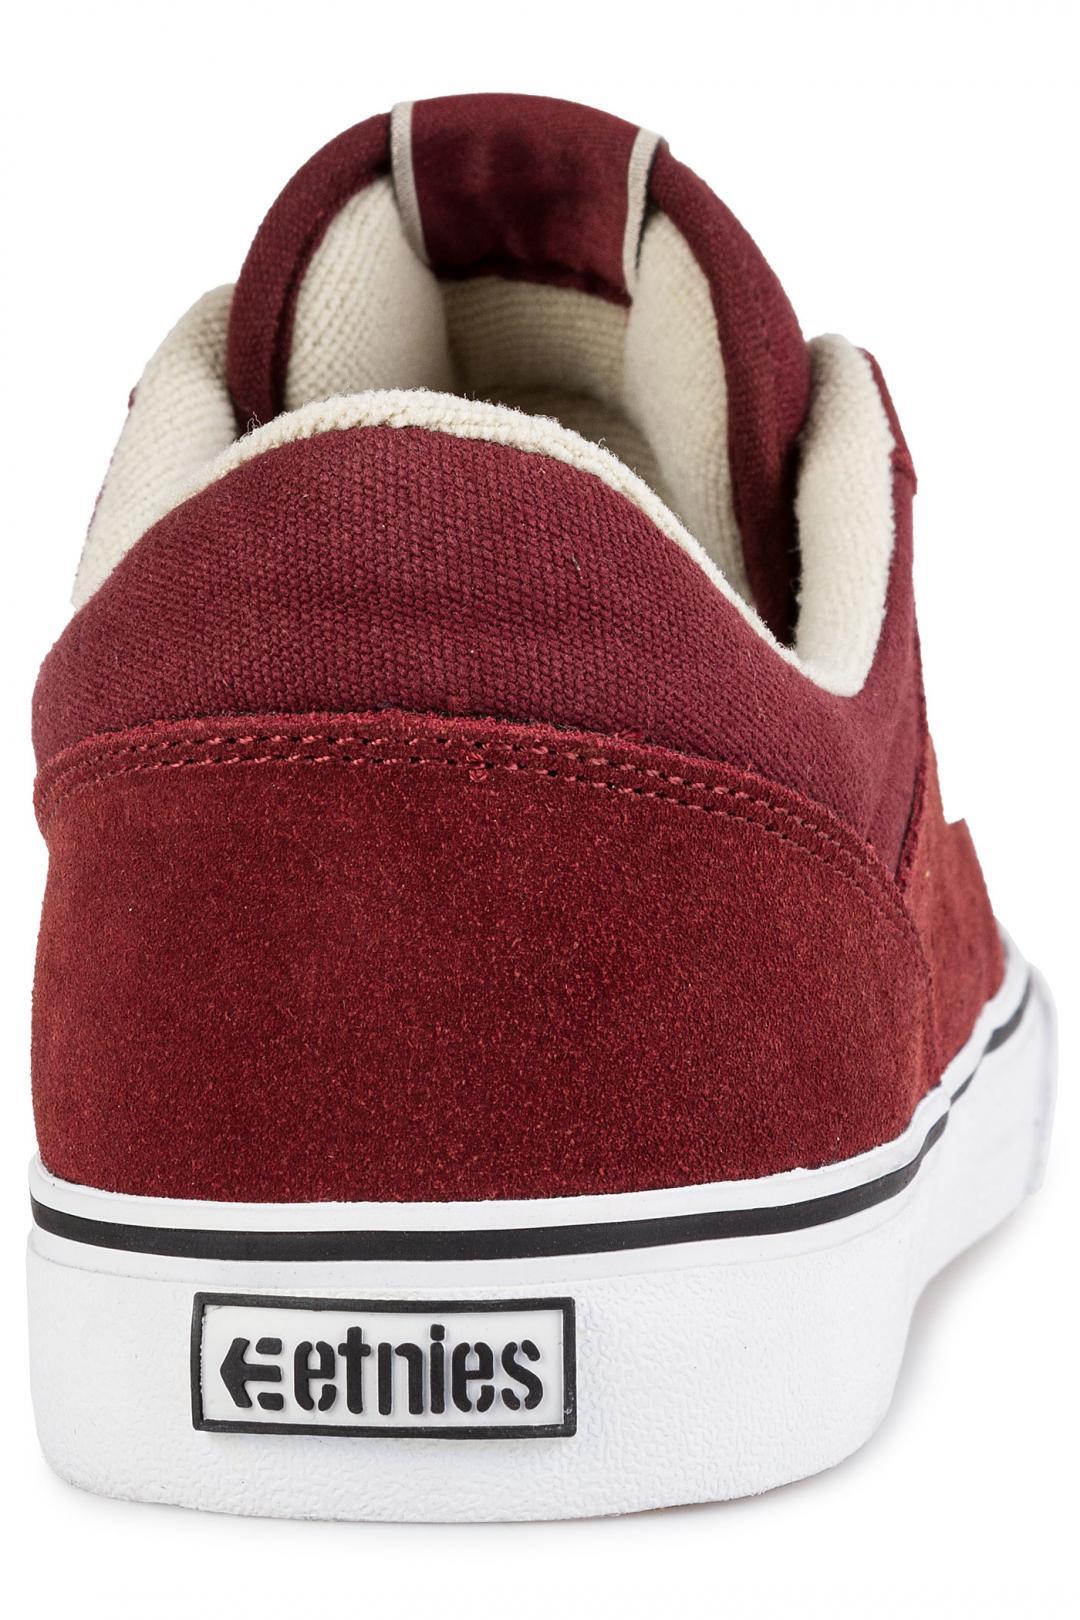 Uomo Etnies Marana Vulc burgundy white | Sneakers low top